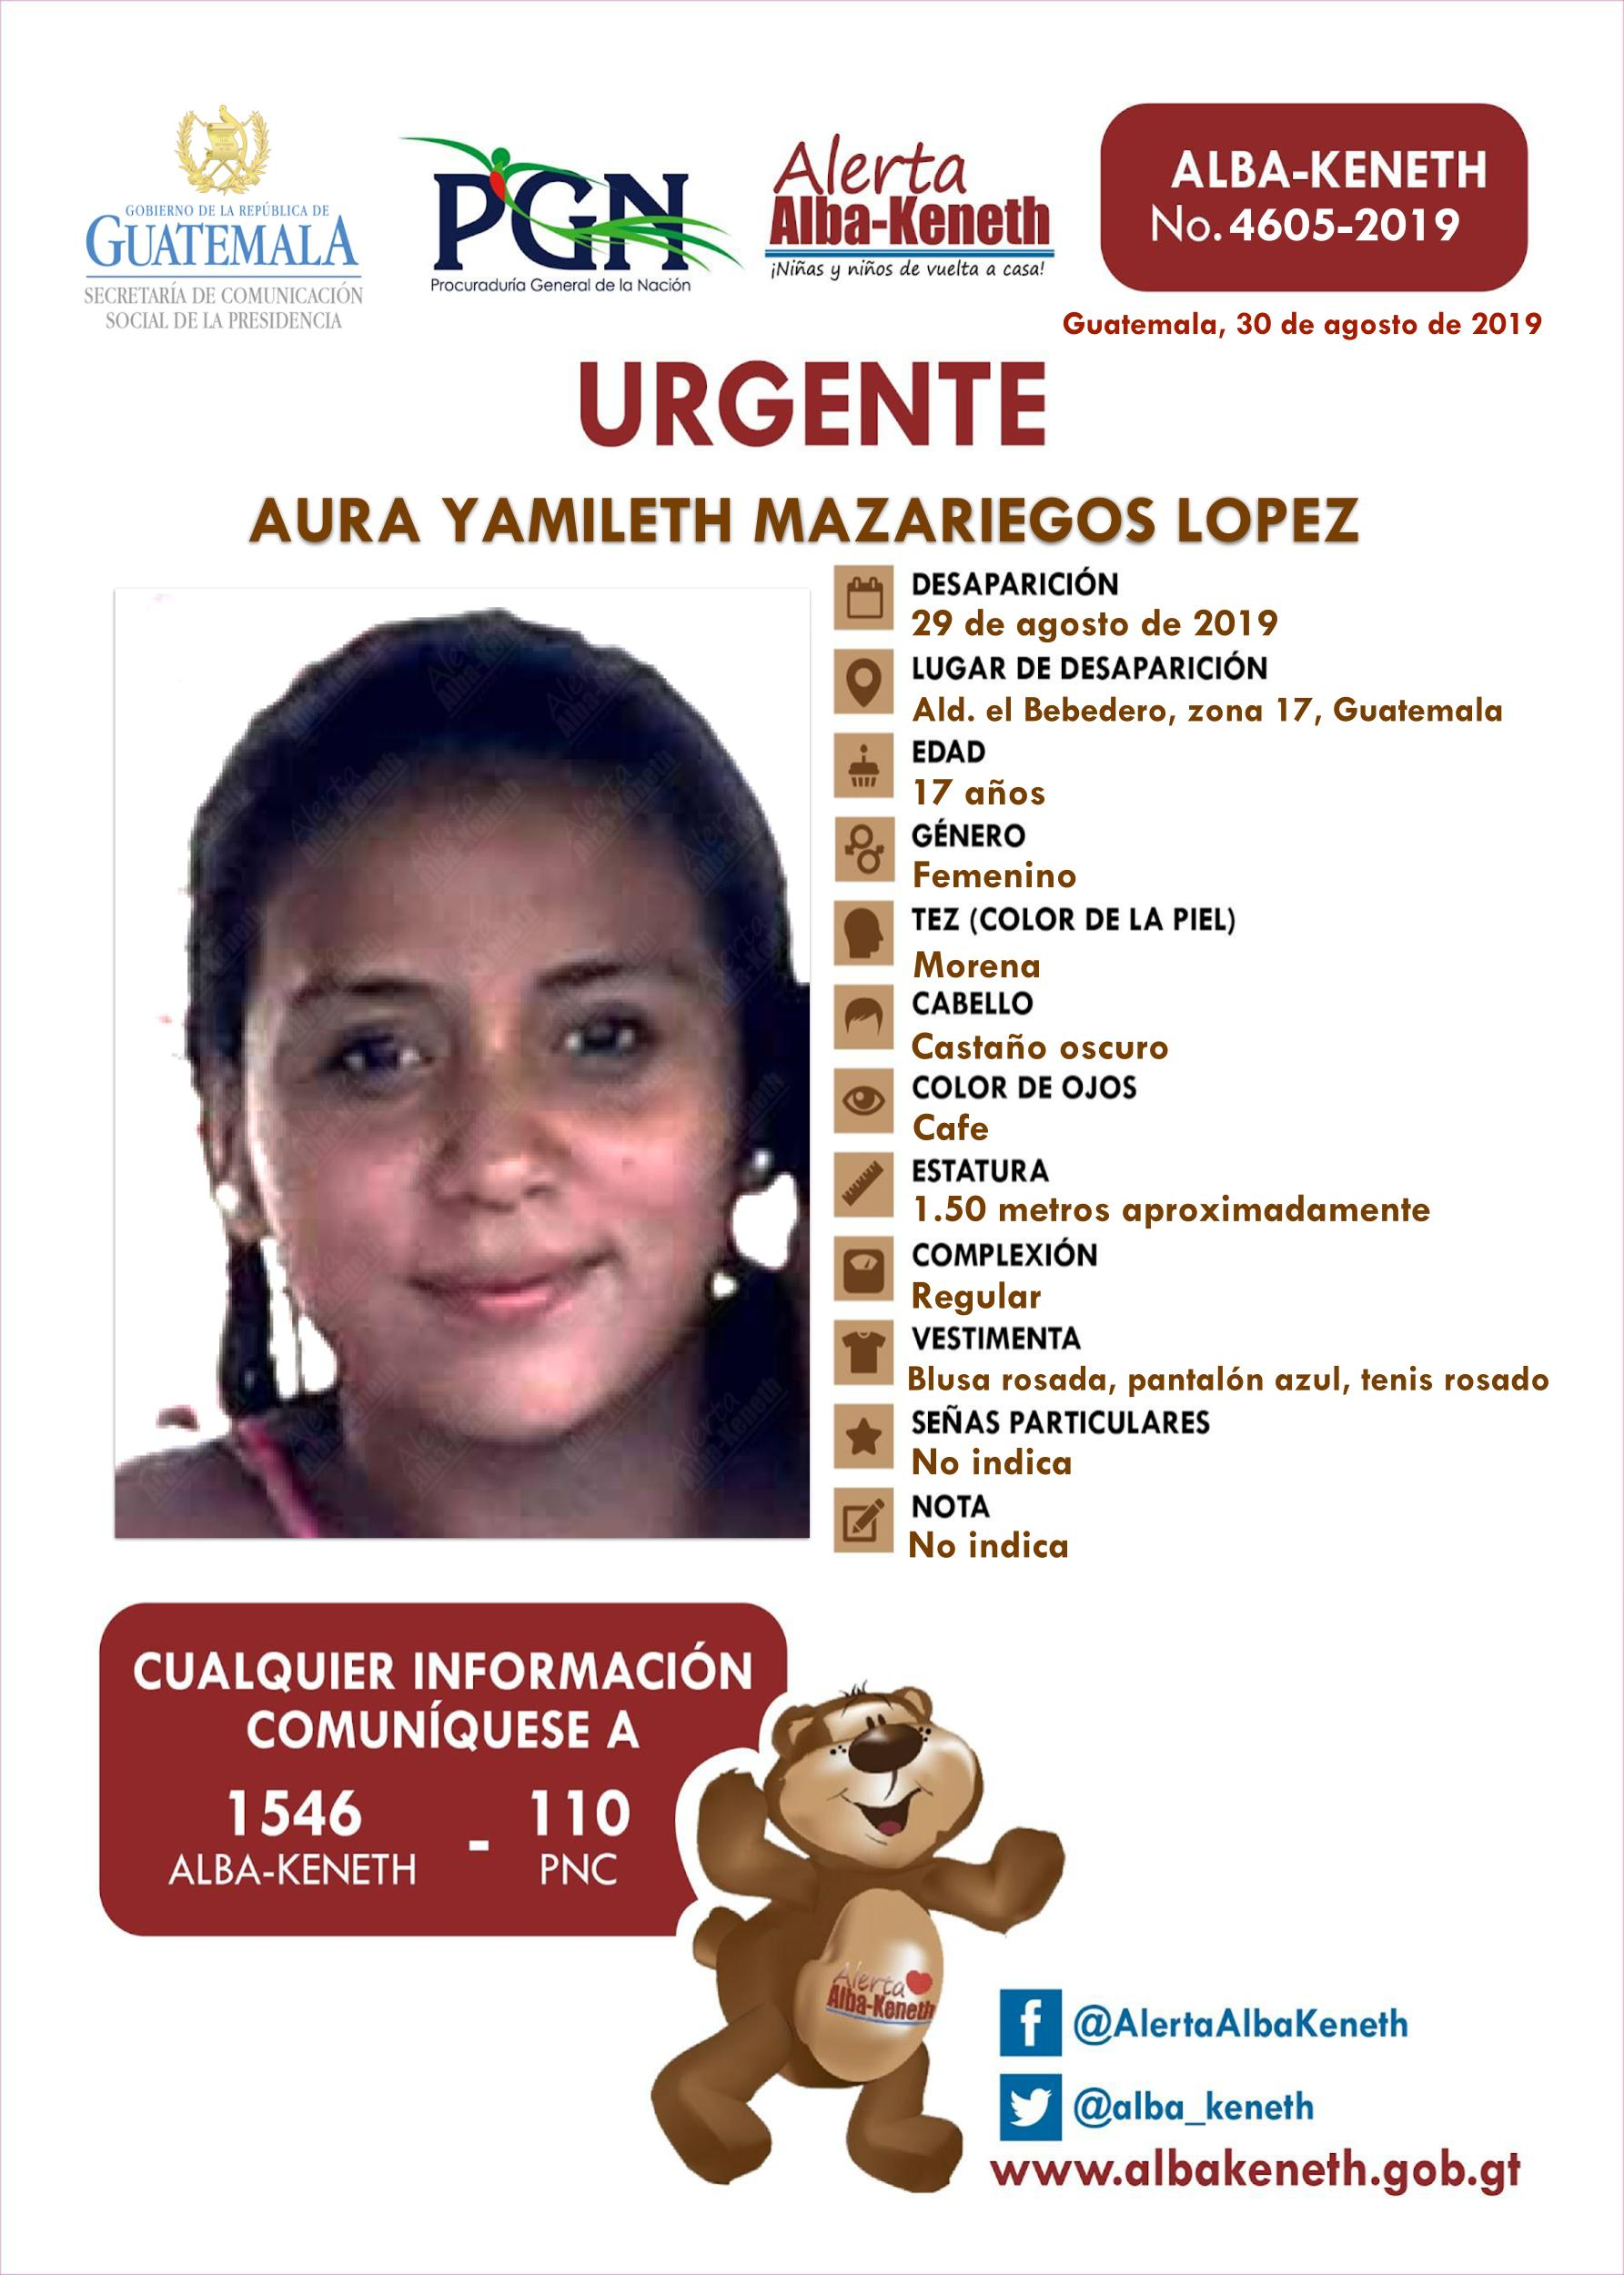 Aura Yamileth Mazariegos Lopez